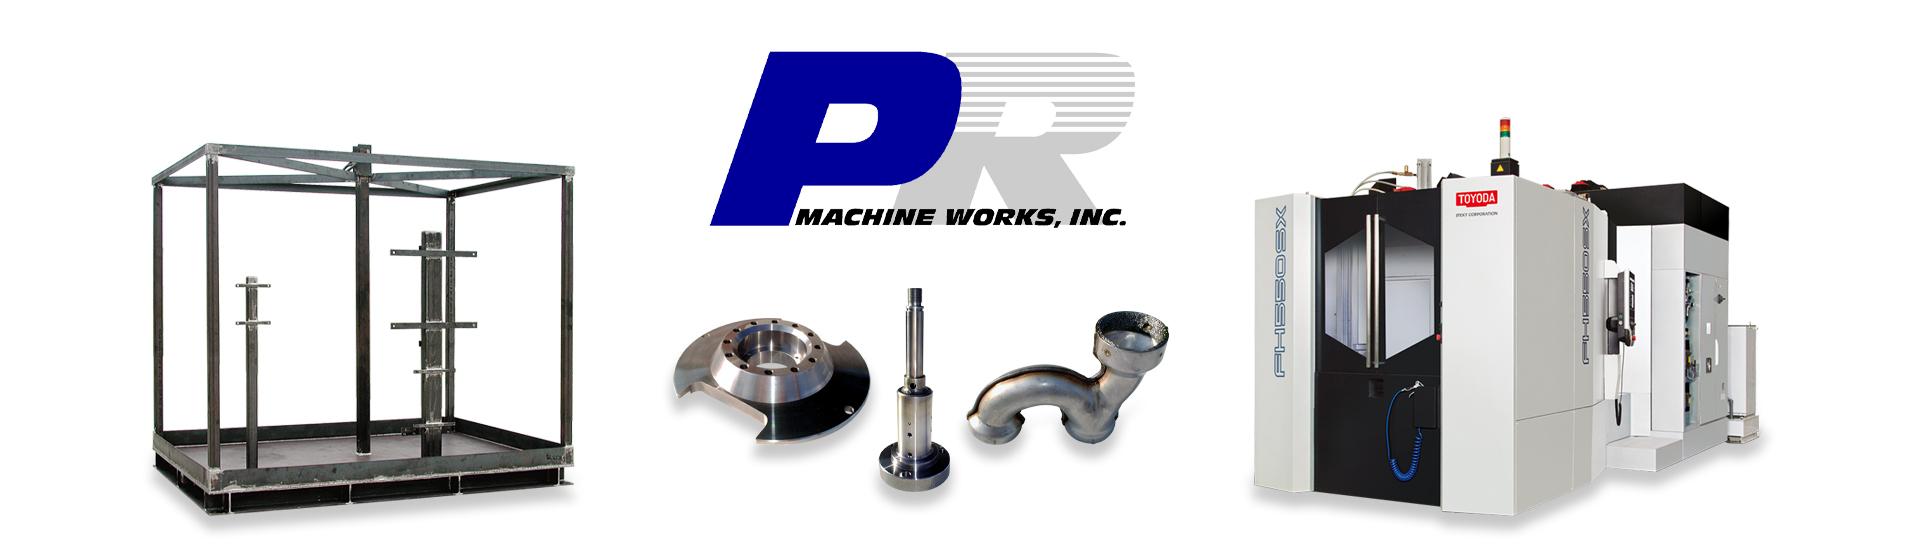 Parts and Logo